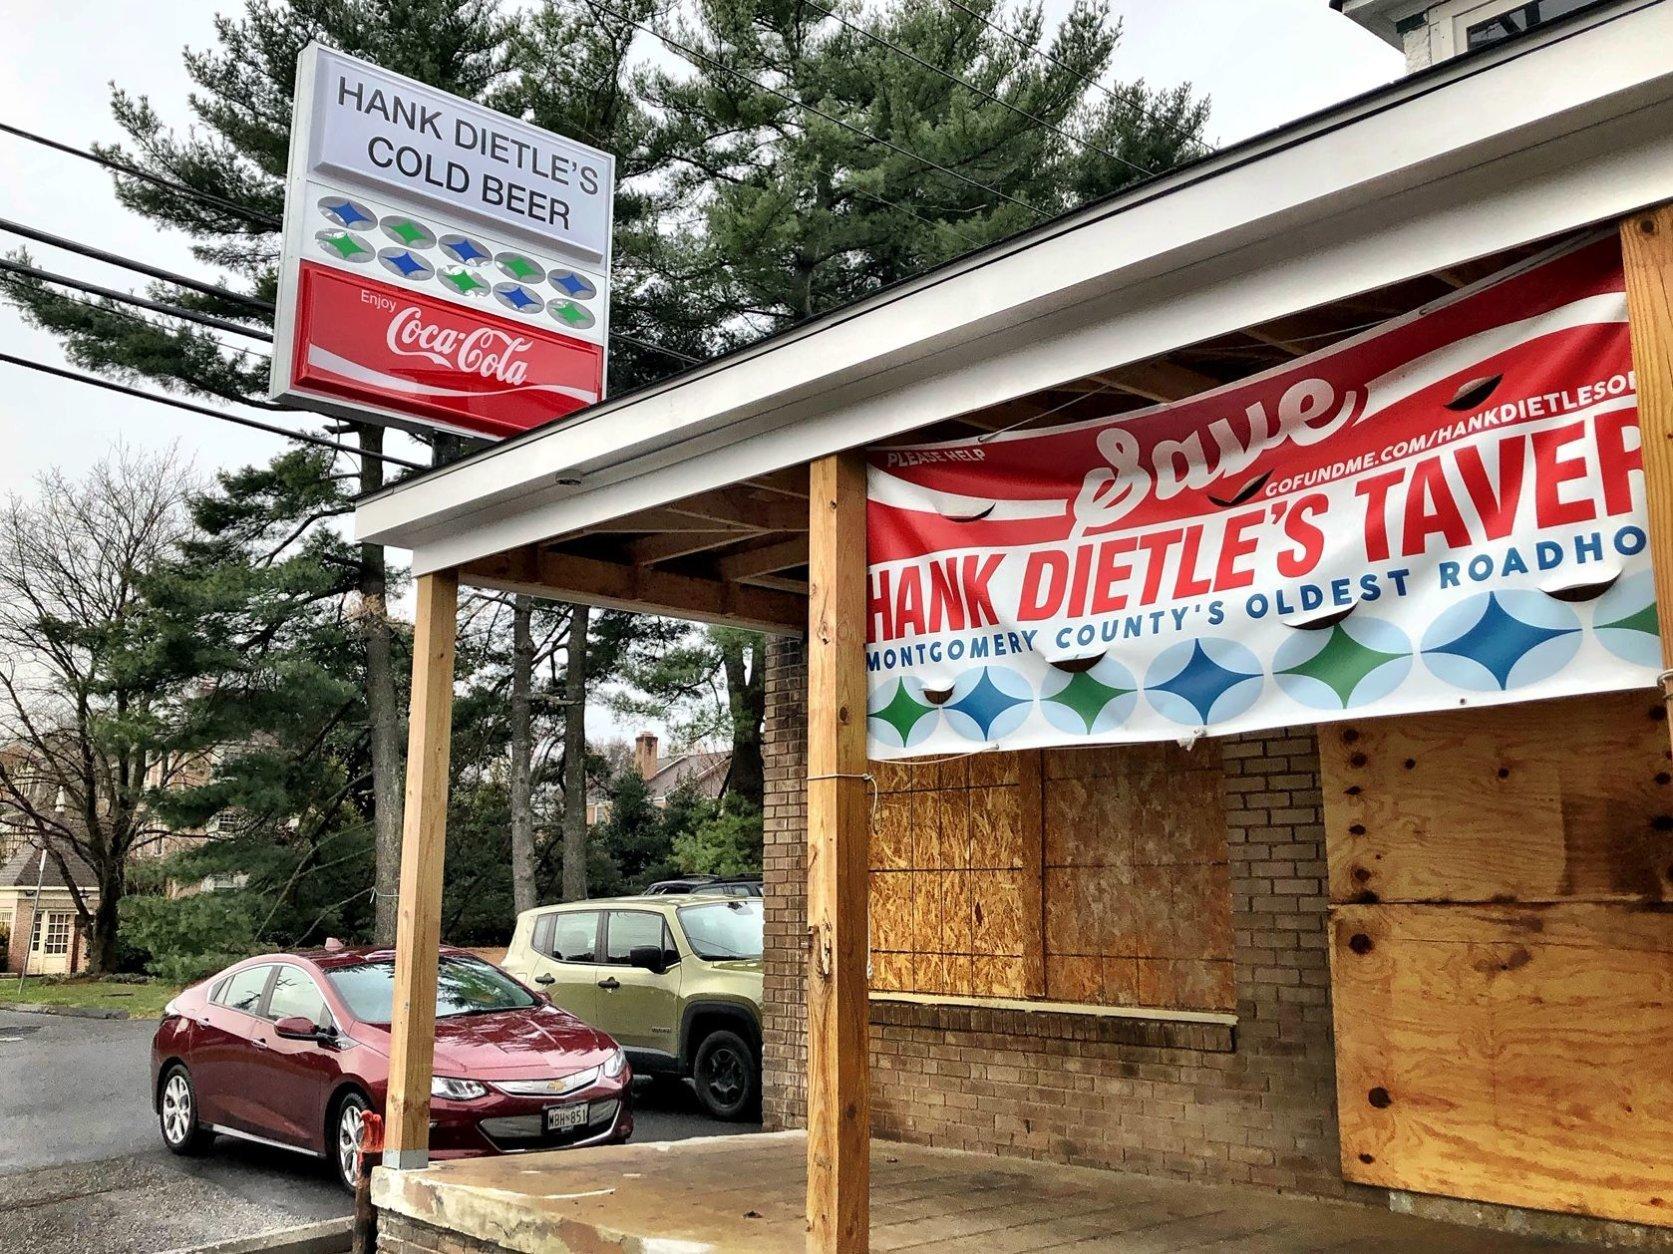 hank dietle's tavern sign